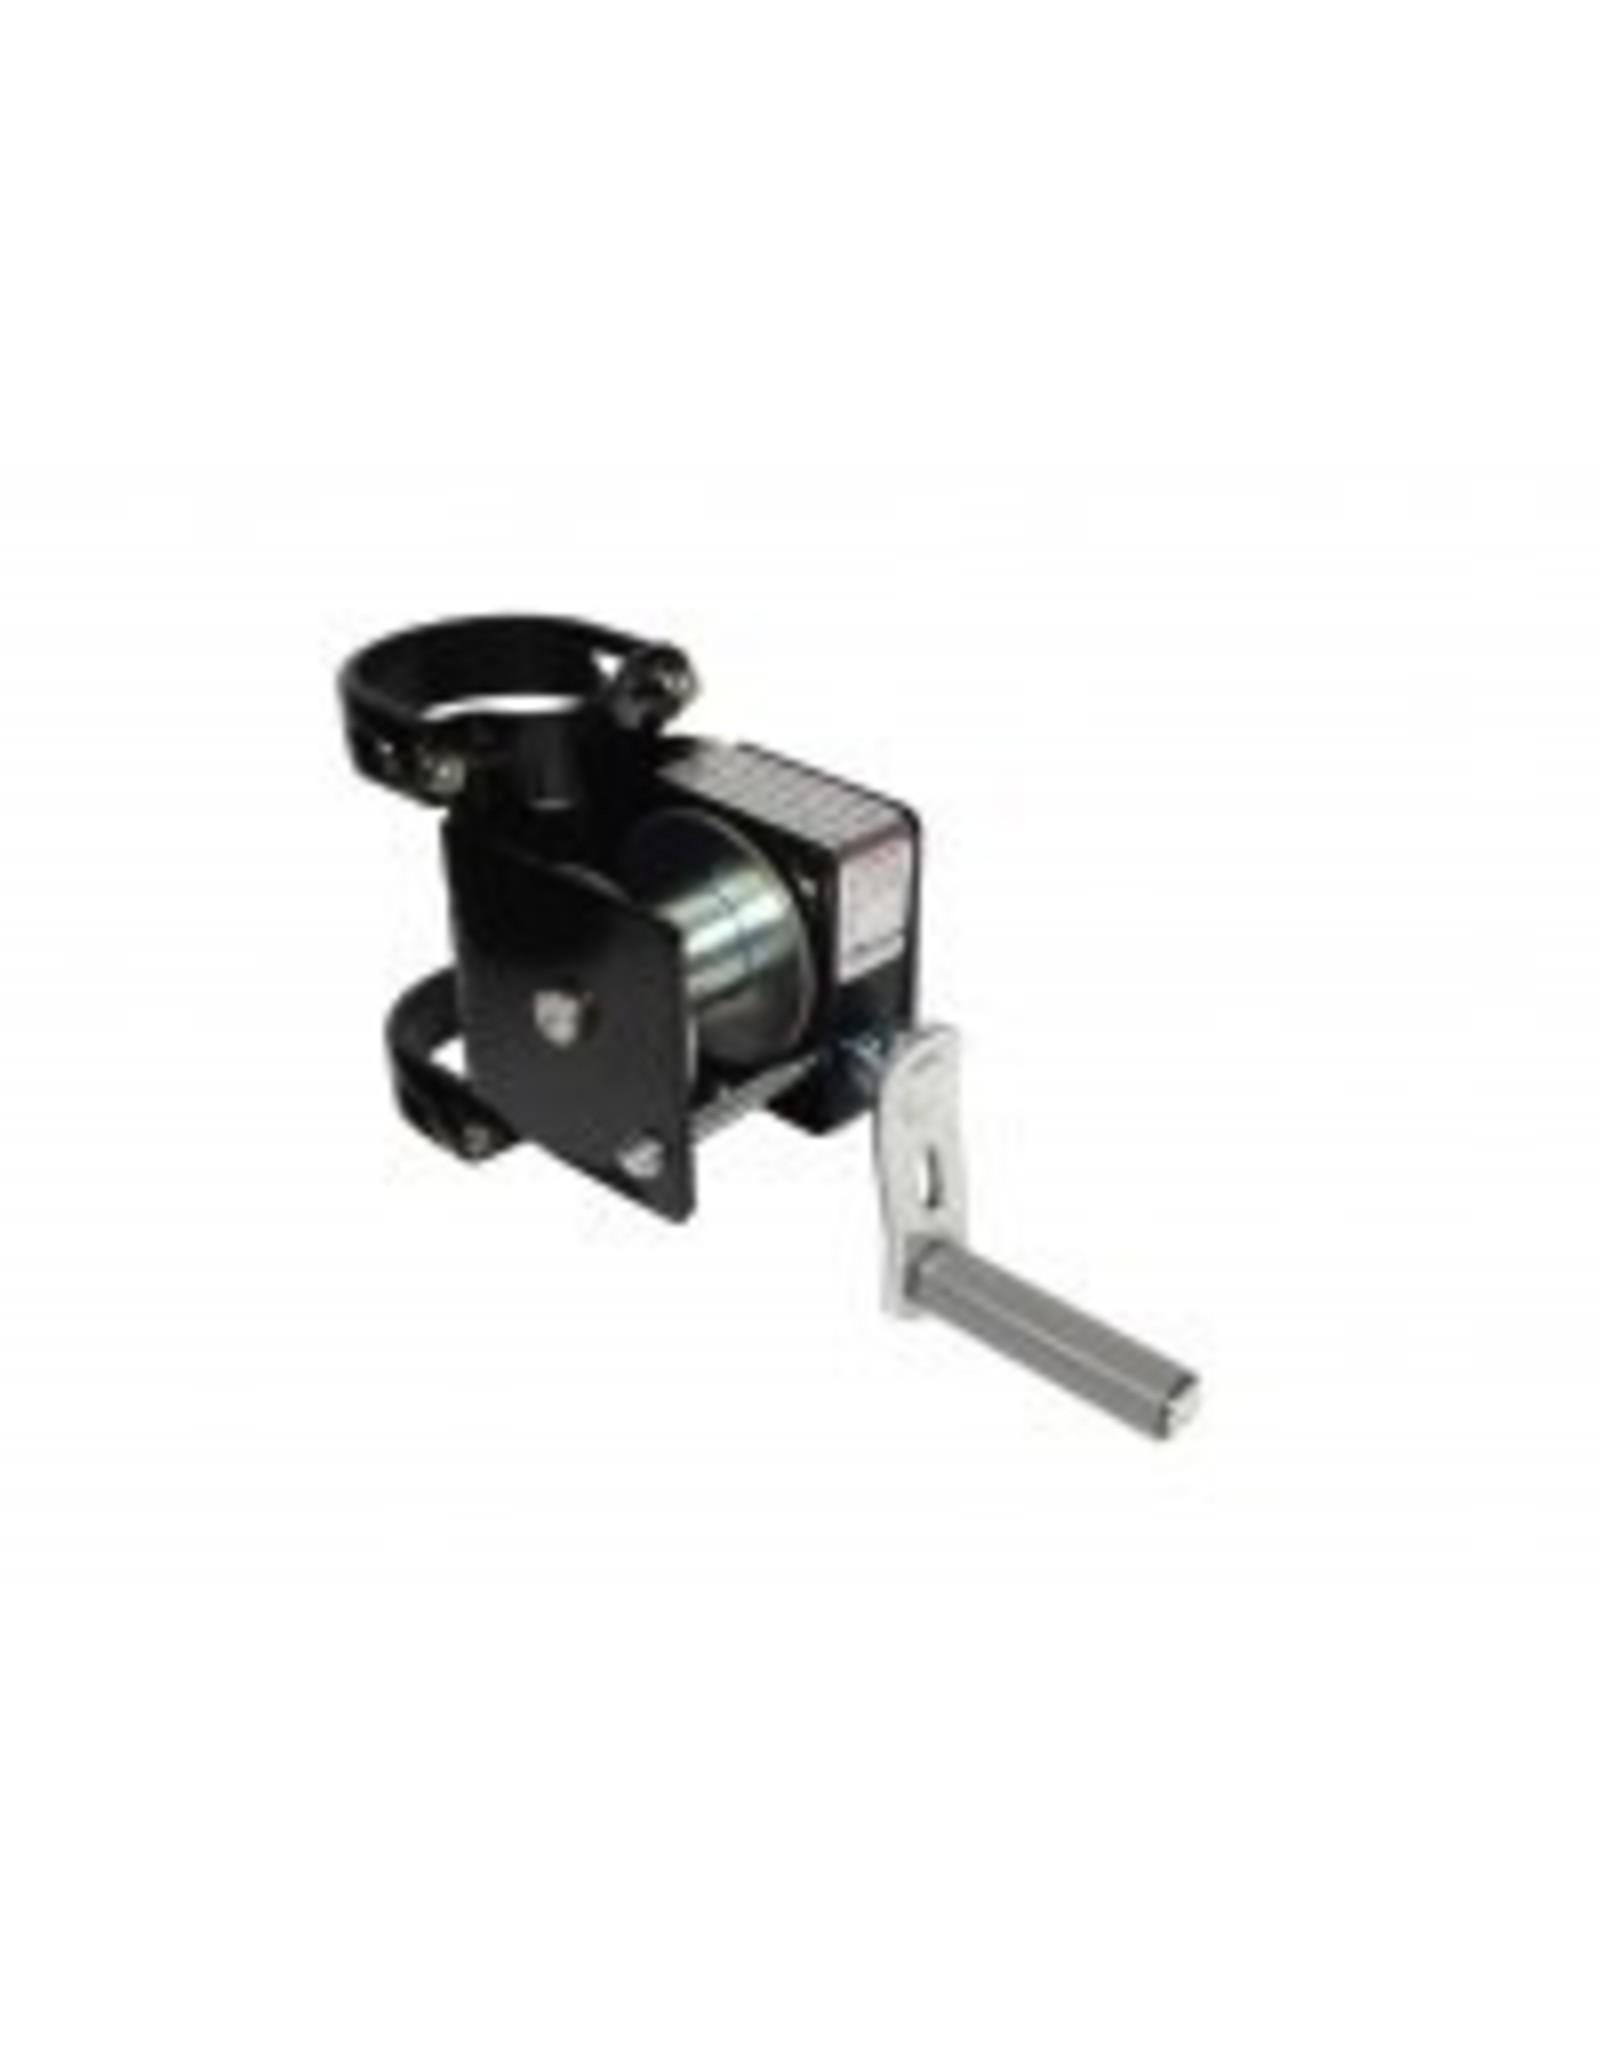 Senoh Heavy Duty Net Ratchet & Crank Handle CO8 or SV15, Black